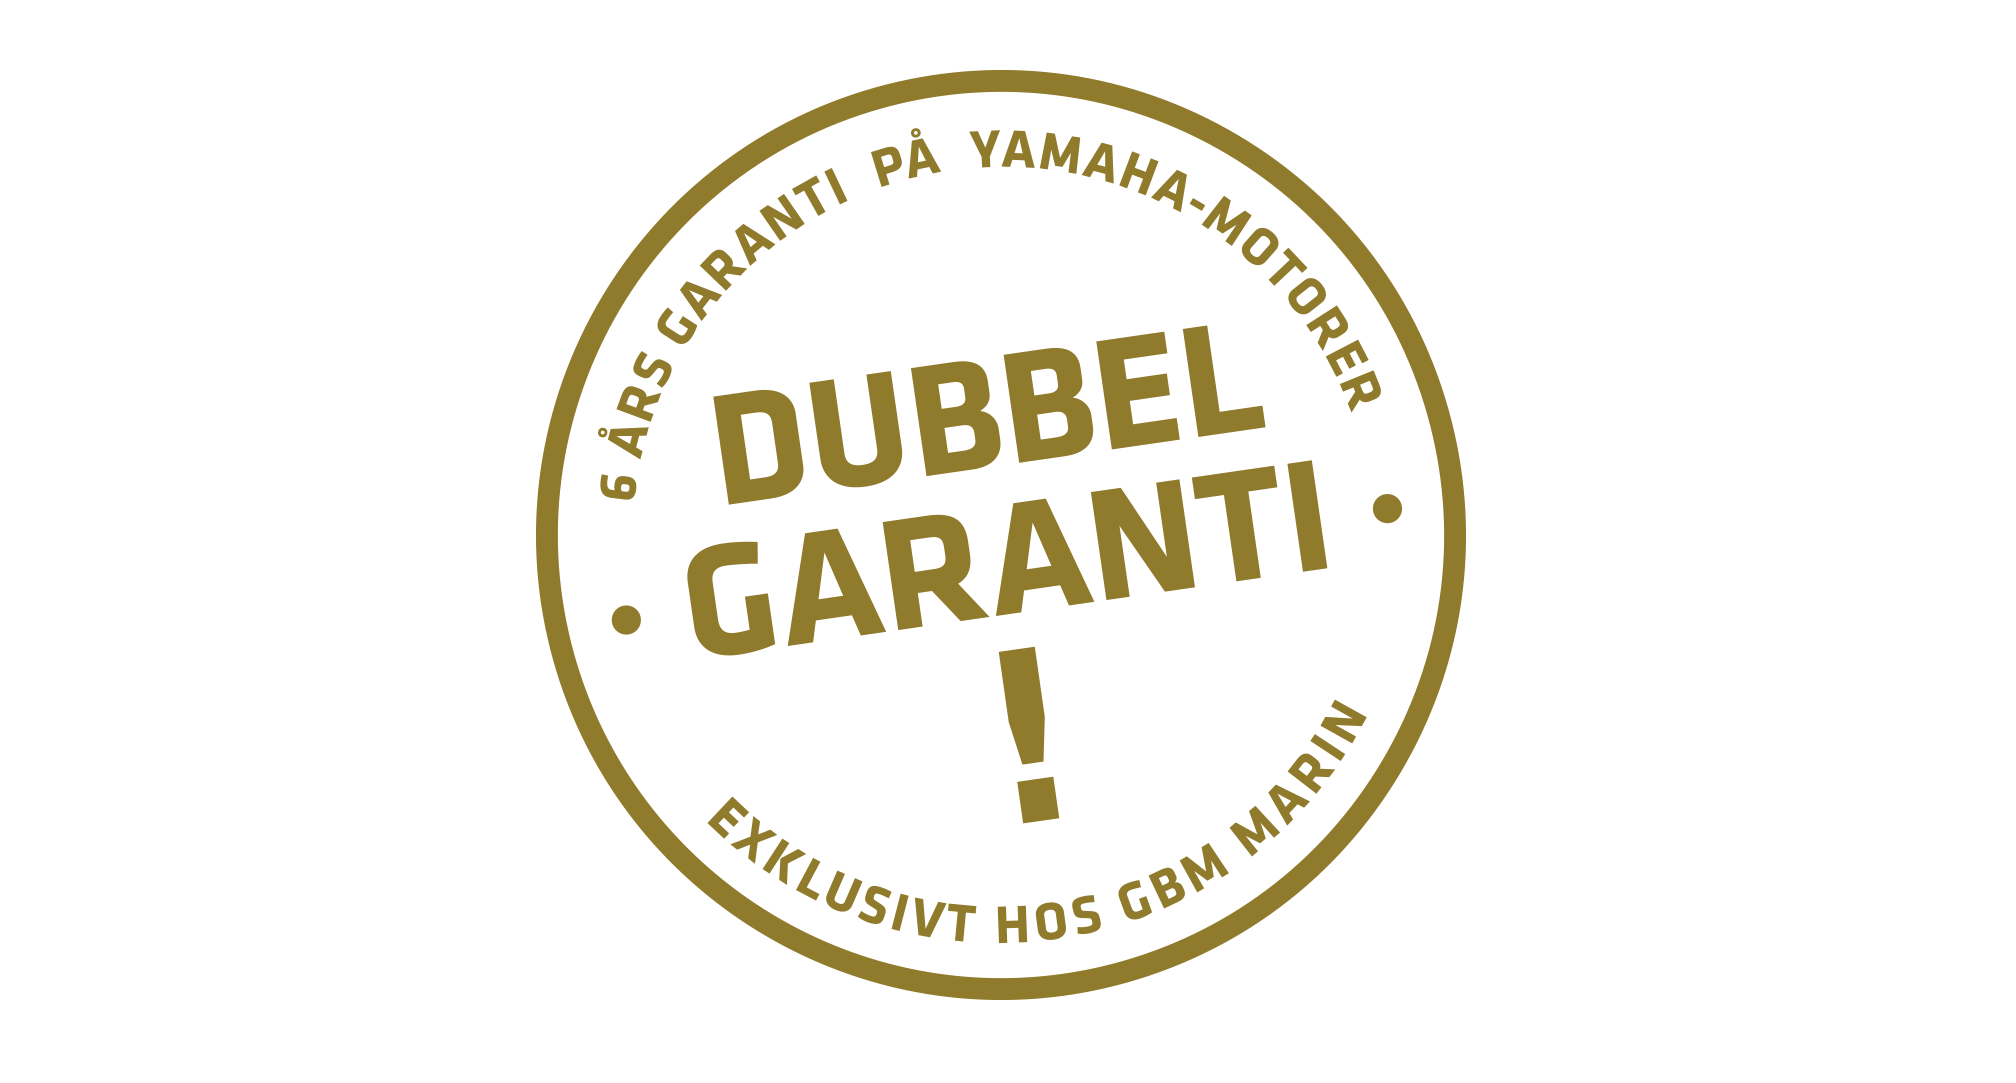 Dubbelgaranti logo GBM